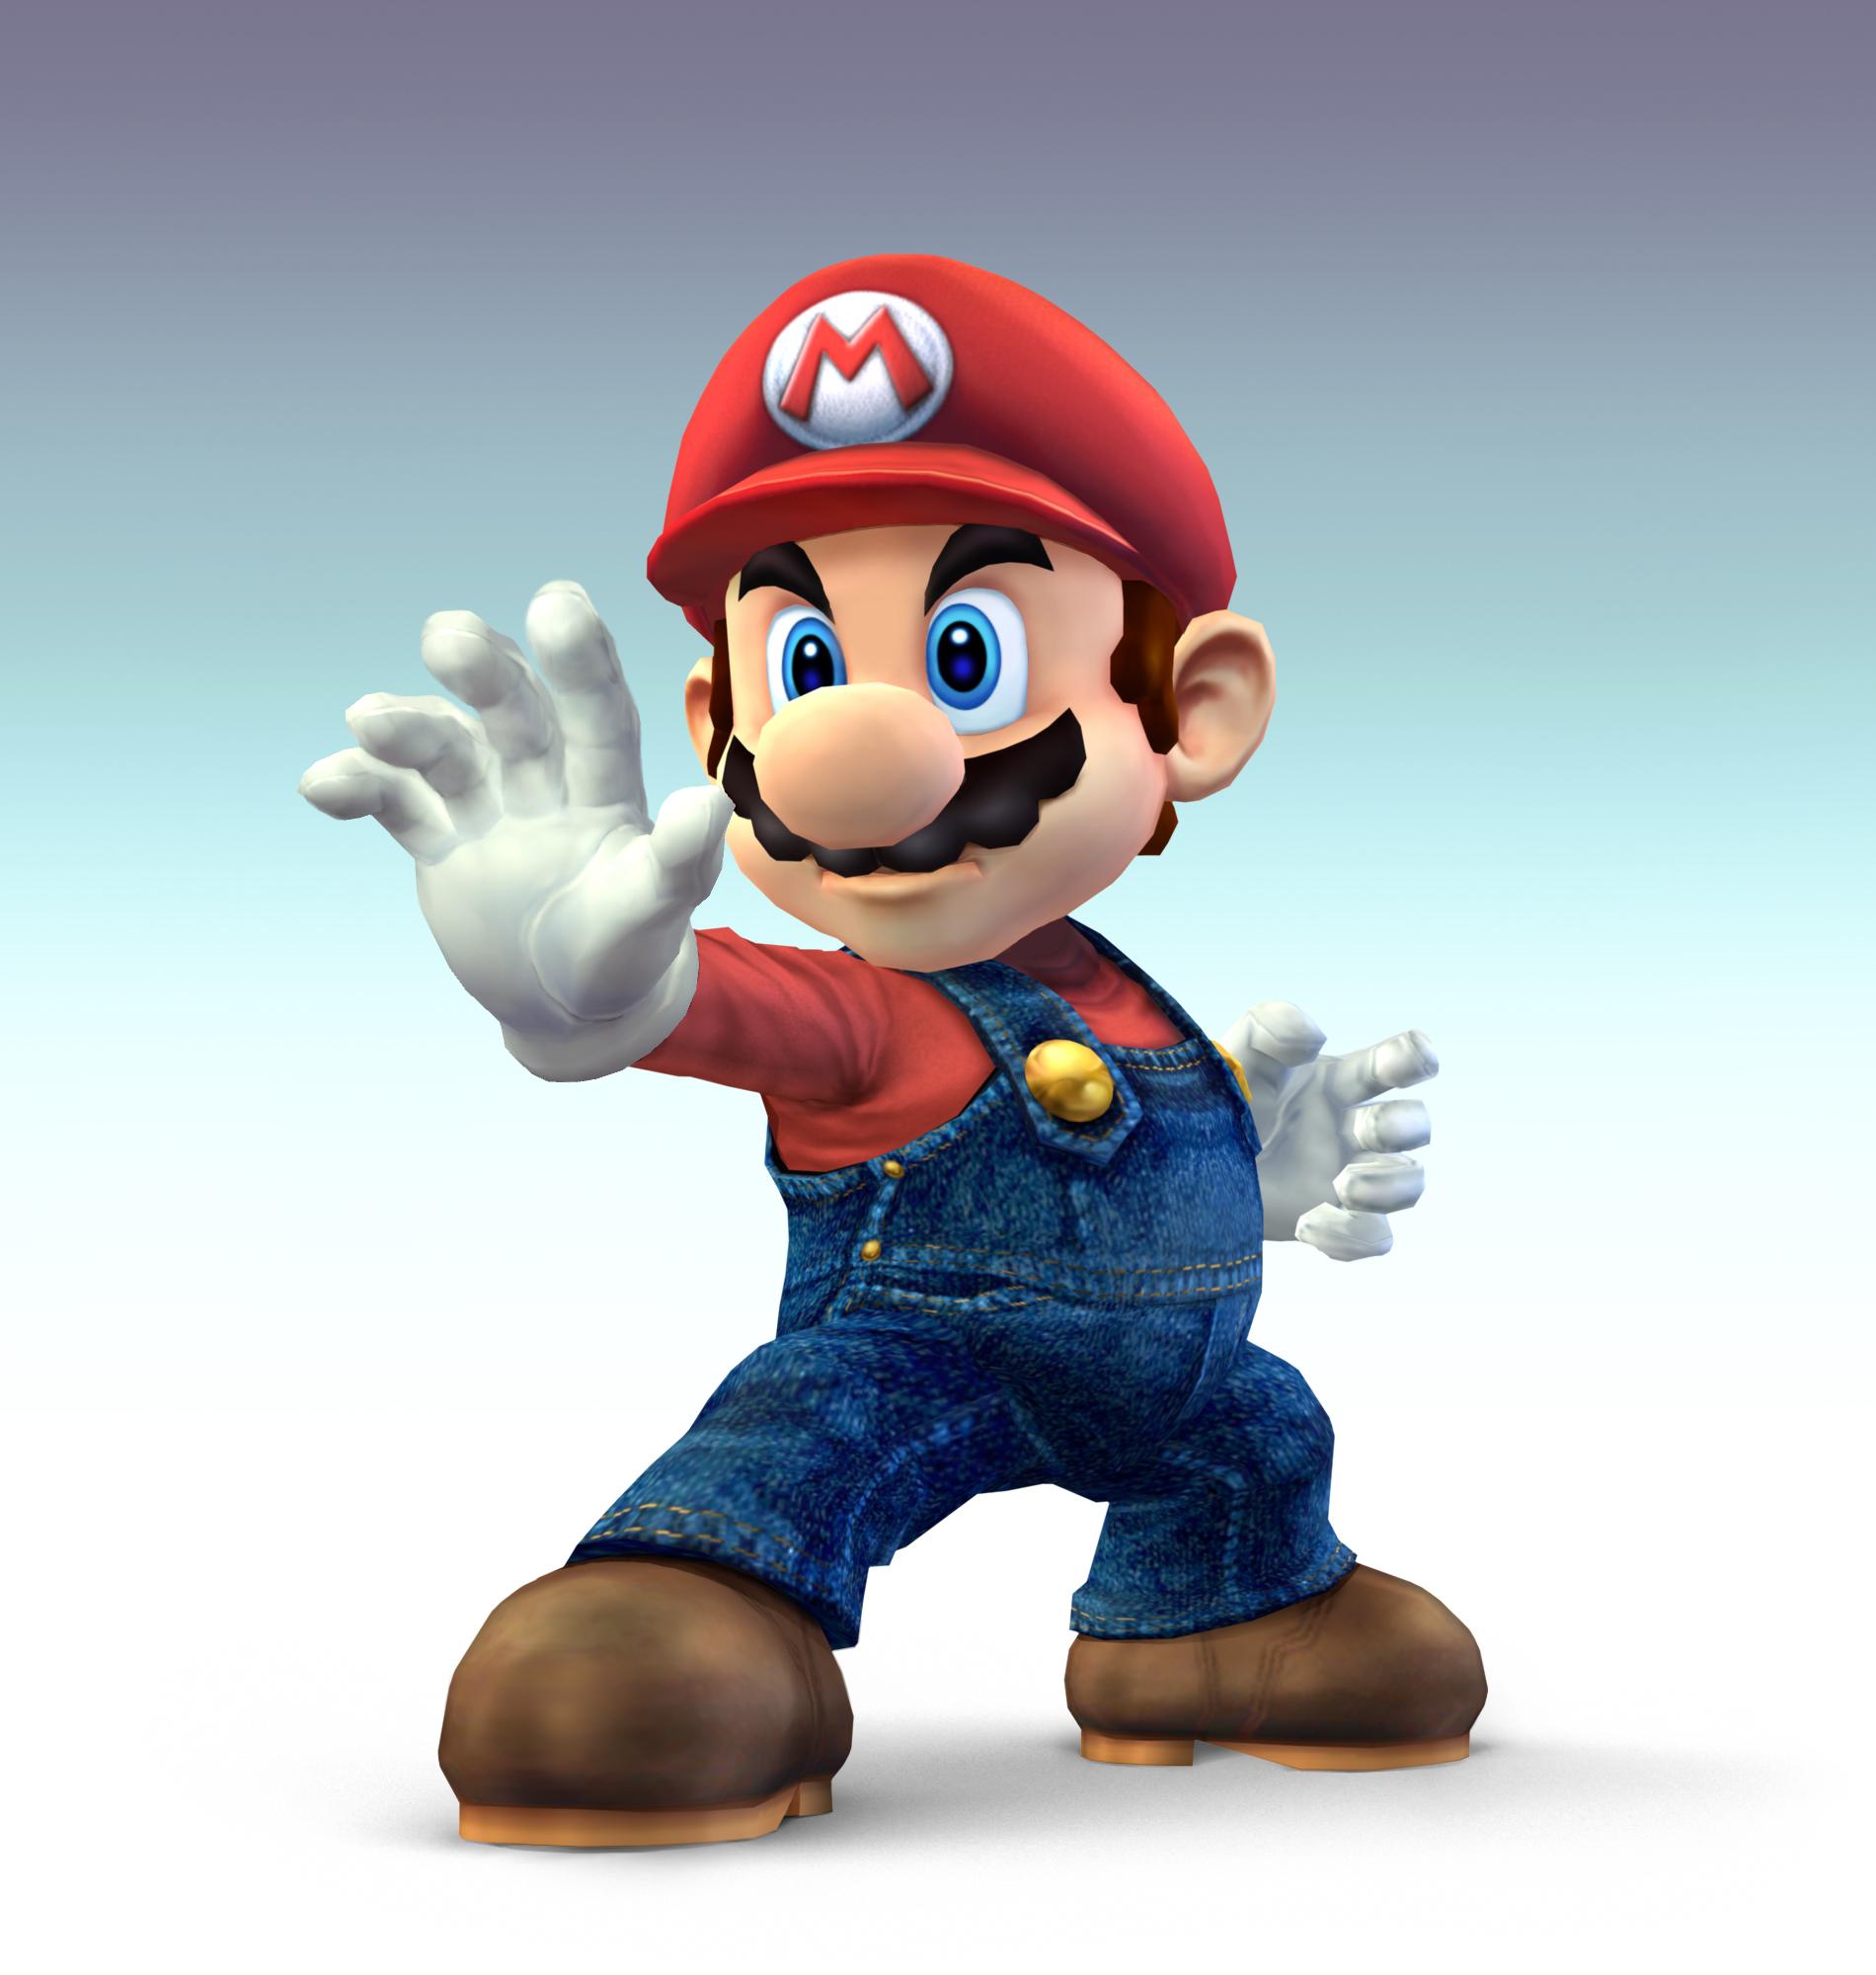 Image - Mario ssb.PNG | Smashpedia | Fandom powered by Wikia